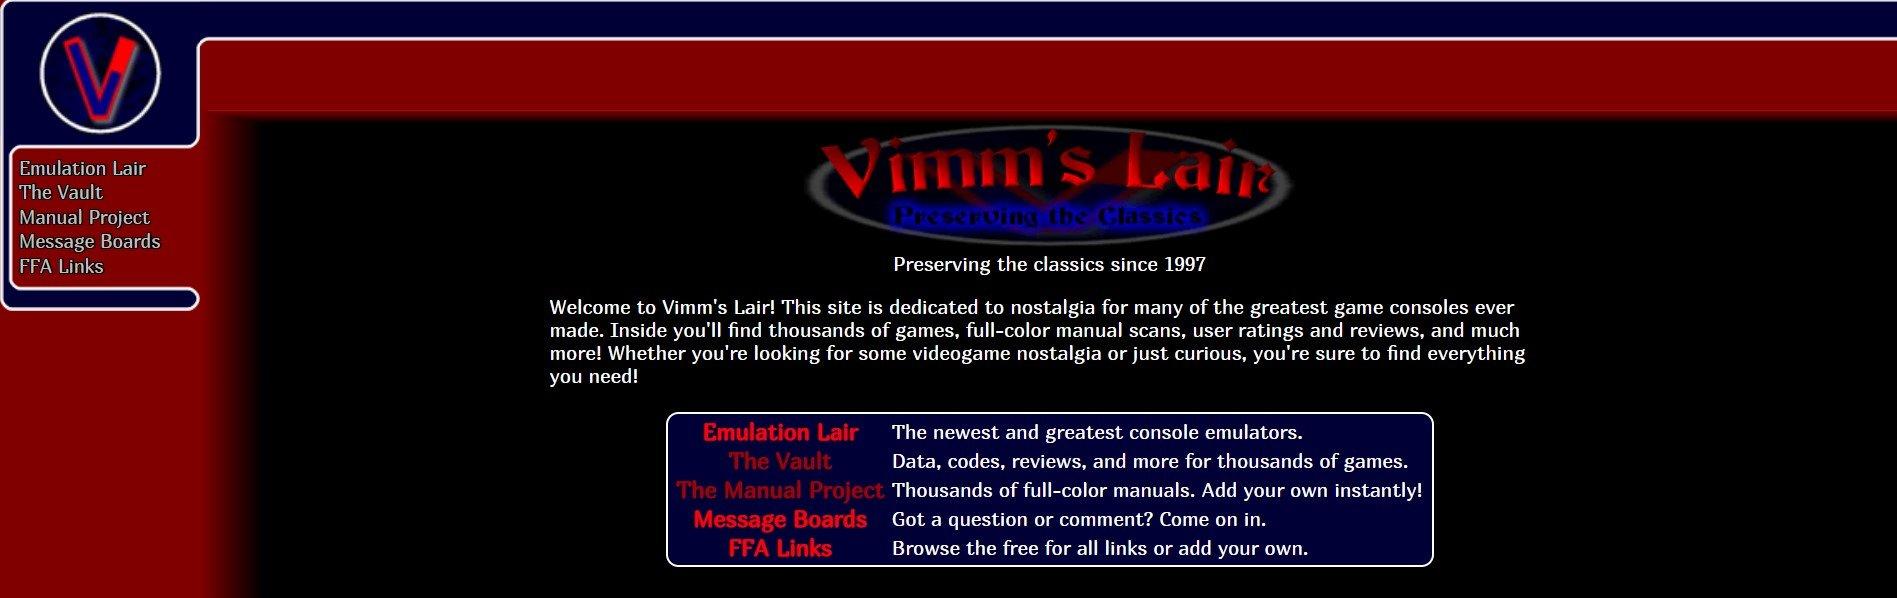 Vimmi's lair